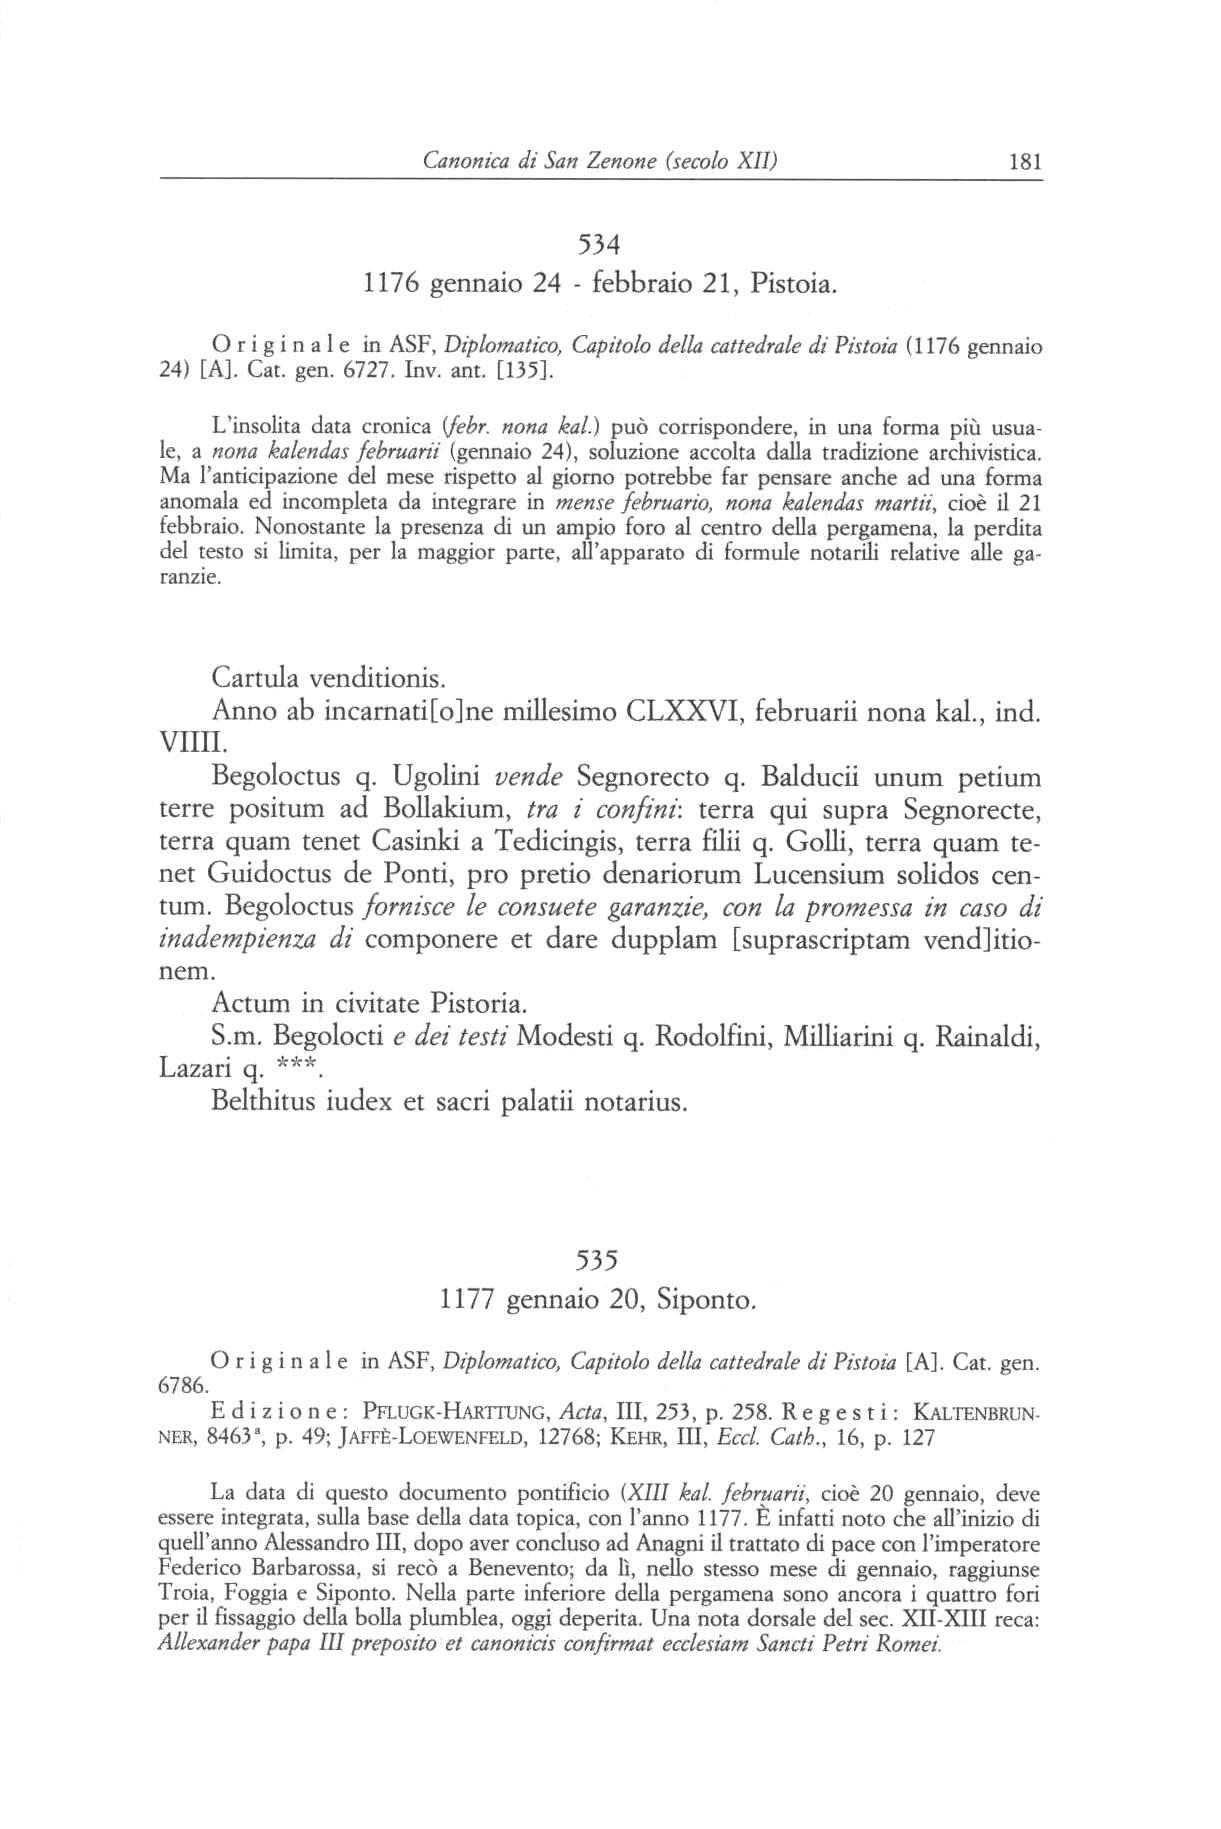 Canonica S. Zenone XII 0181.jpg